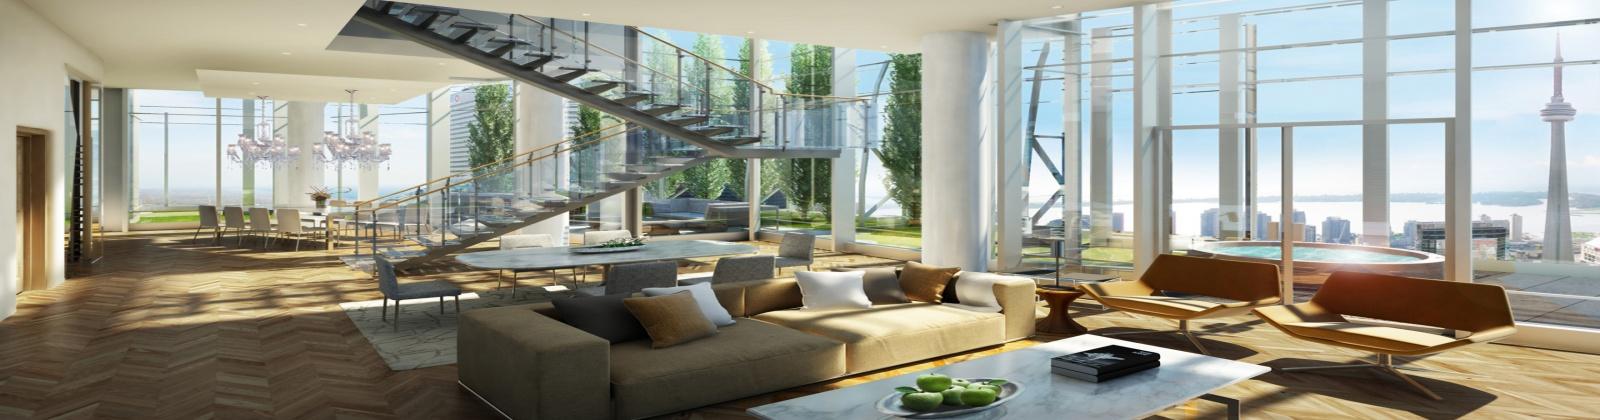 2211 South Priam Loop,Lokeren,Colorado,6 Bedrooms Bedrooms,3 Rooms Rooms,3 BathroomsBathrooms,Apartment,1002